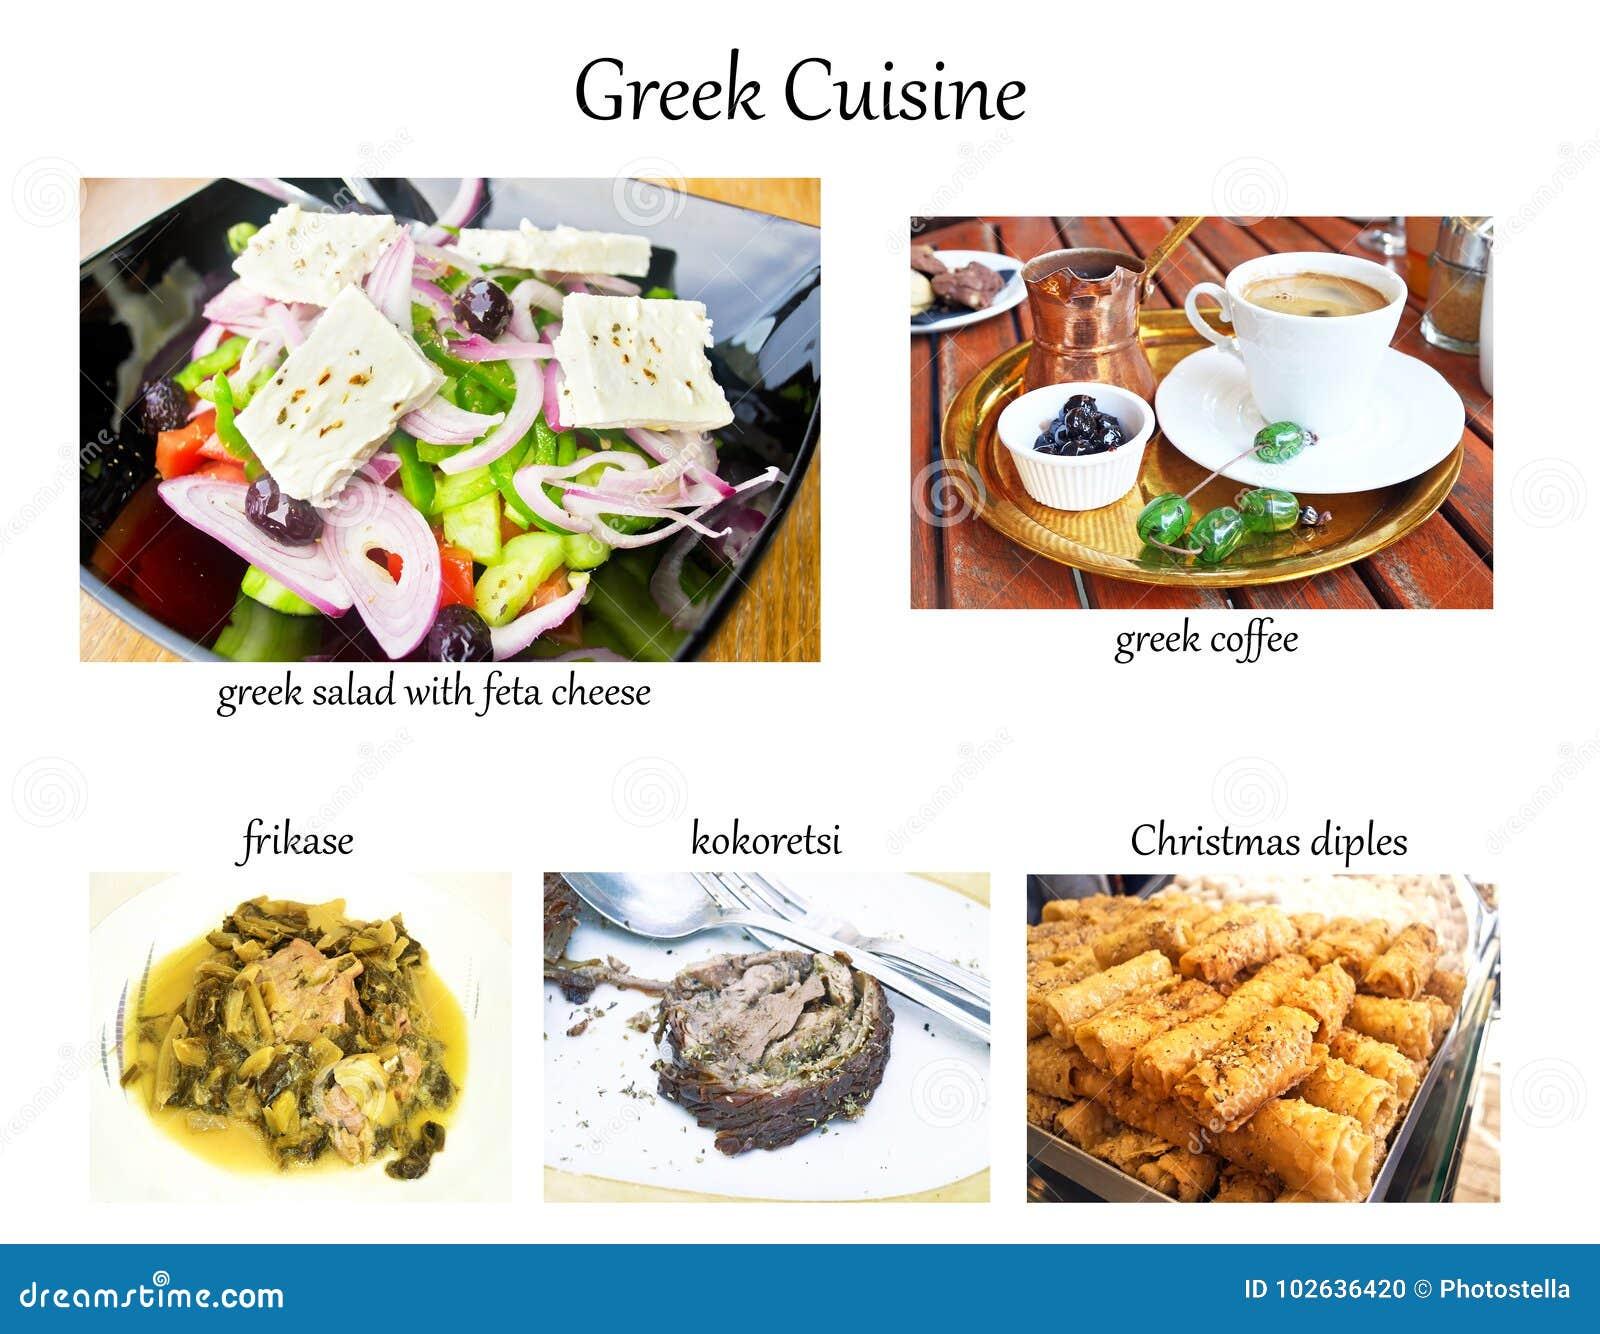 Collage con cucina greca - caffè, insalata, frikase, kokoretsi, diples di natale